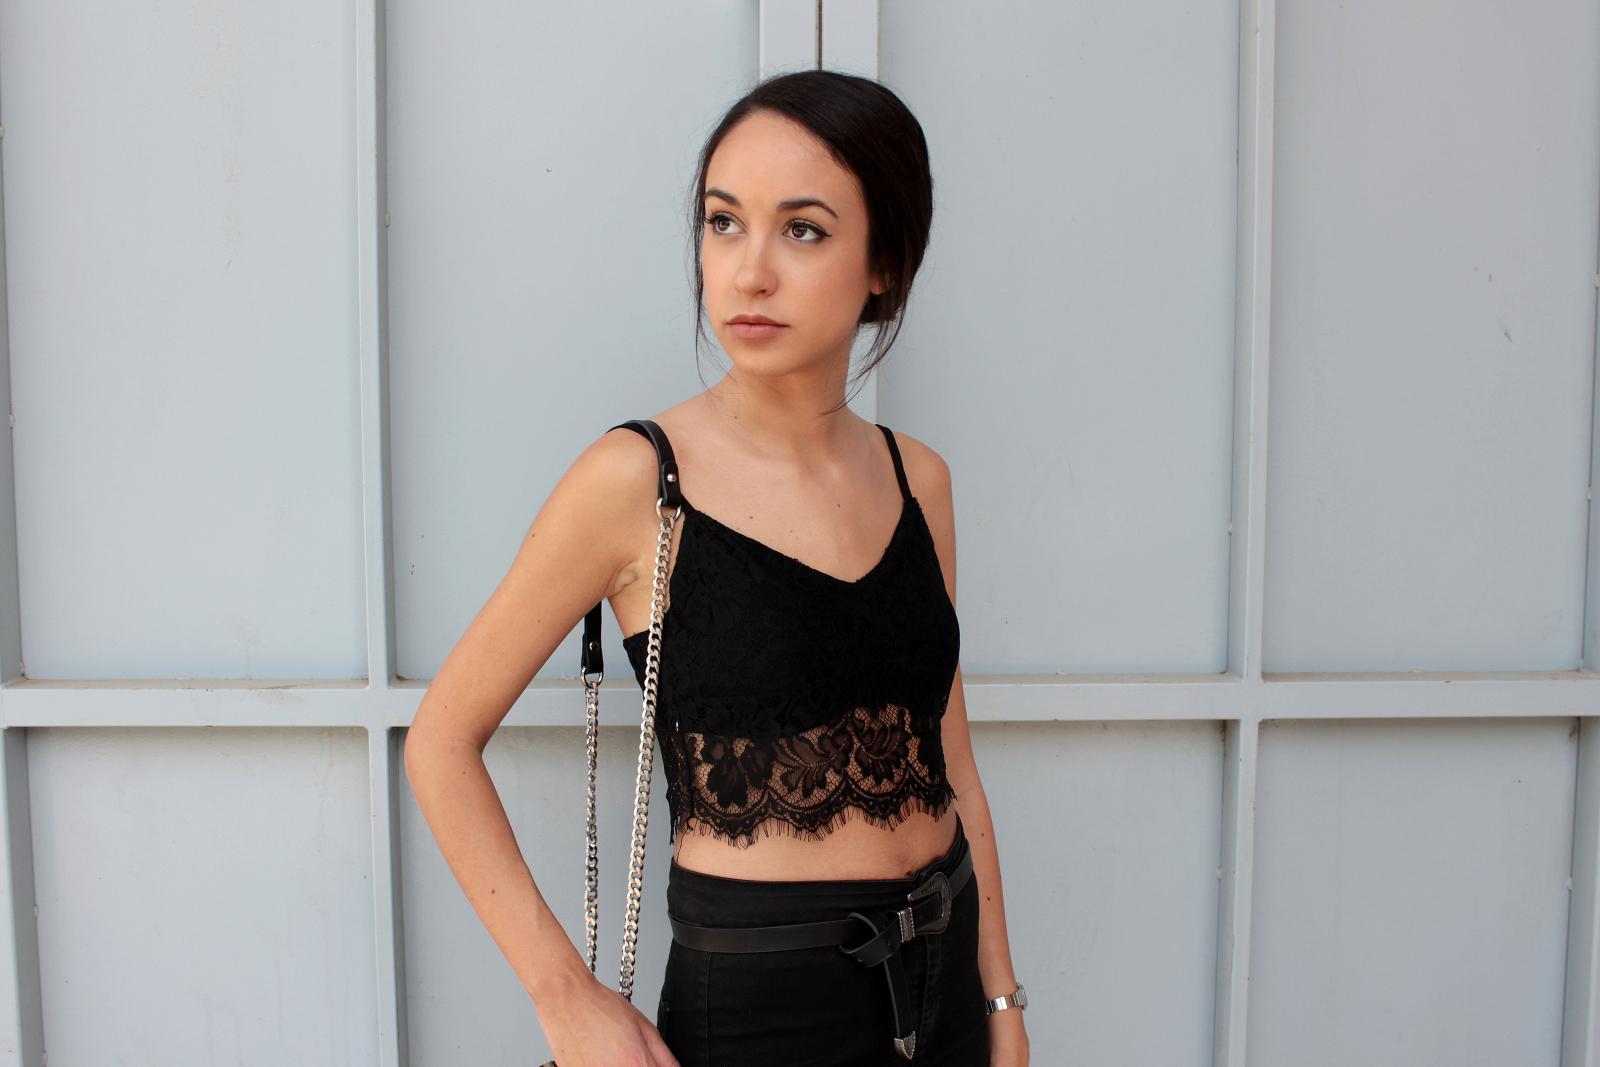 Esther Luque